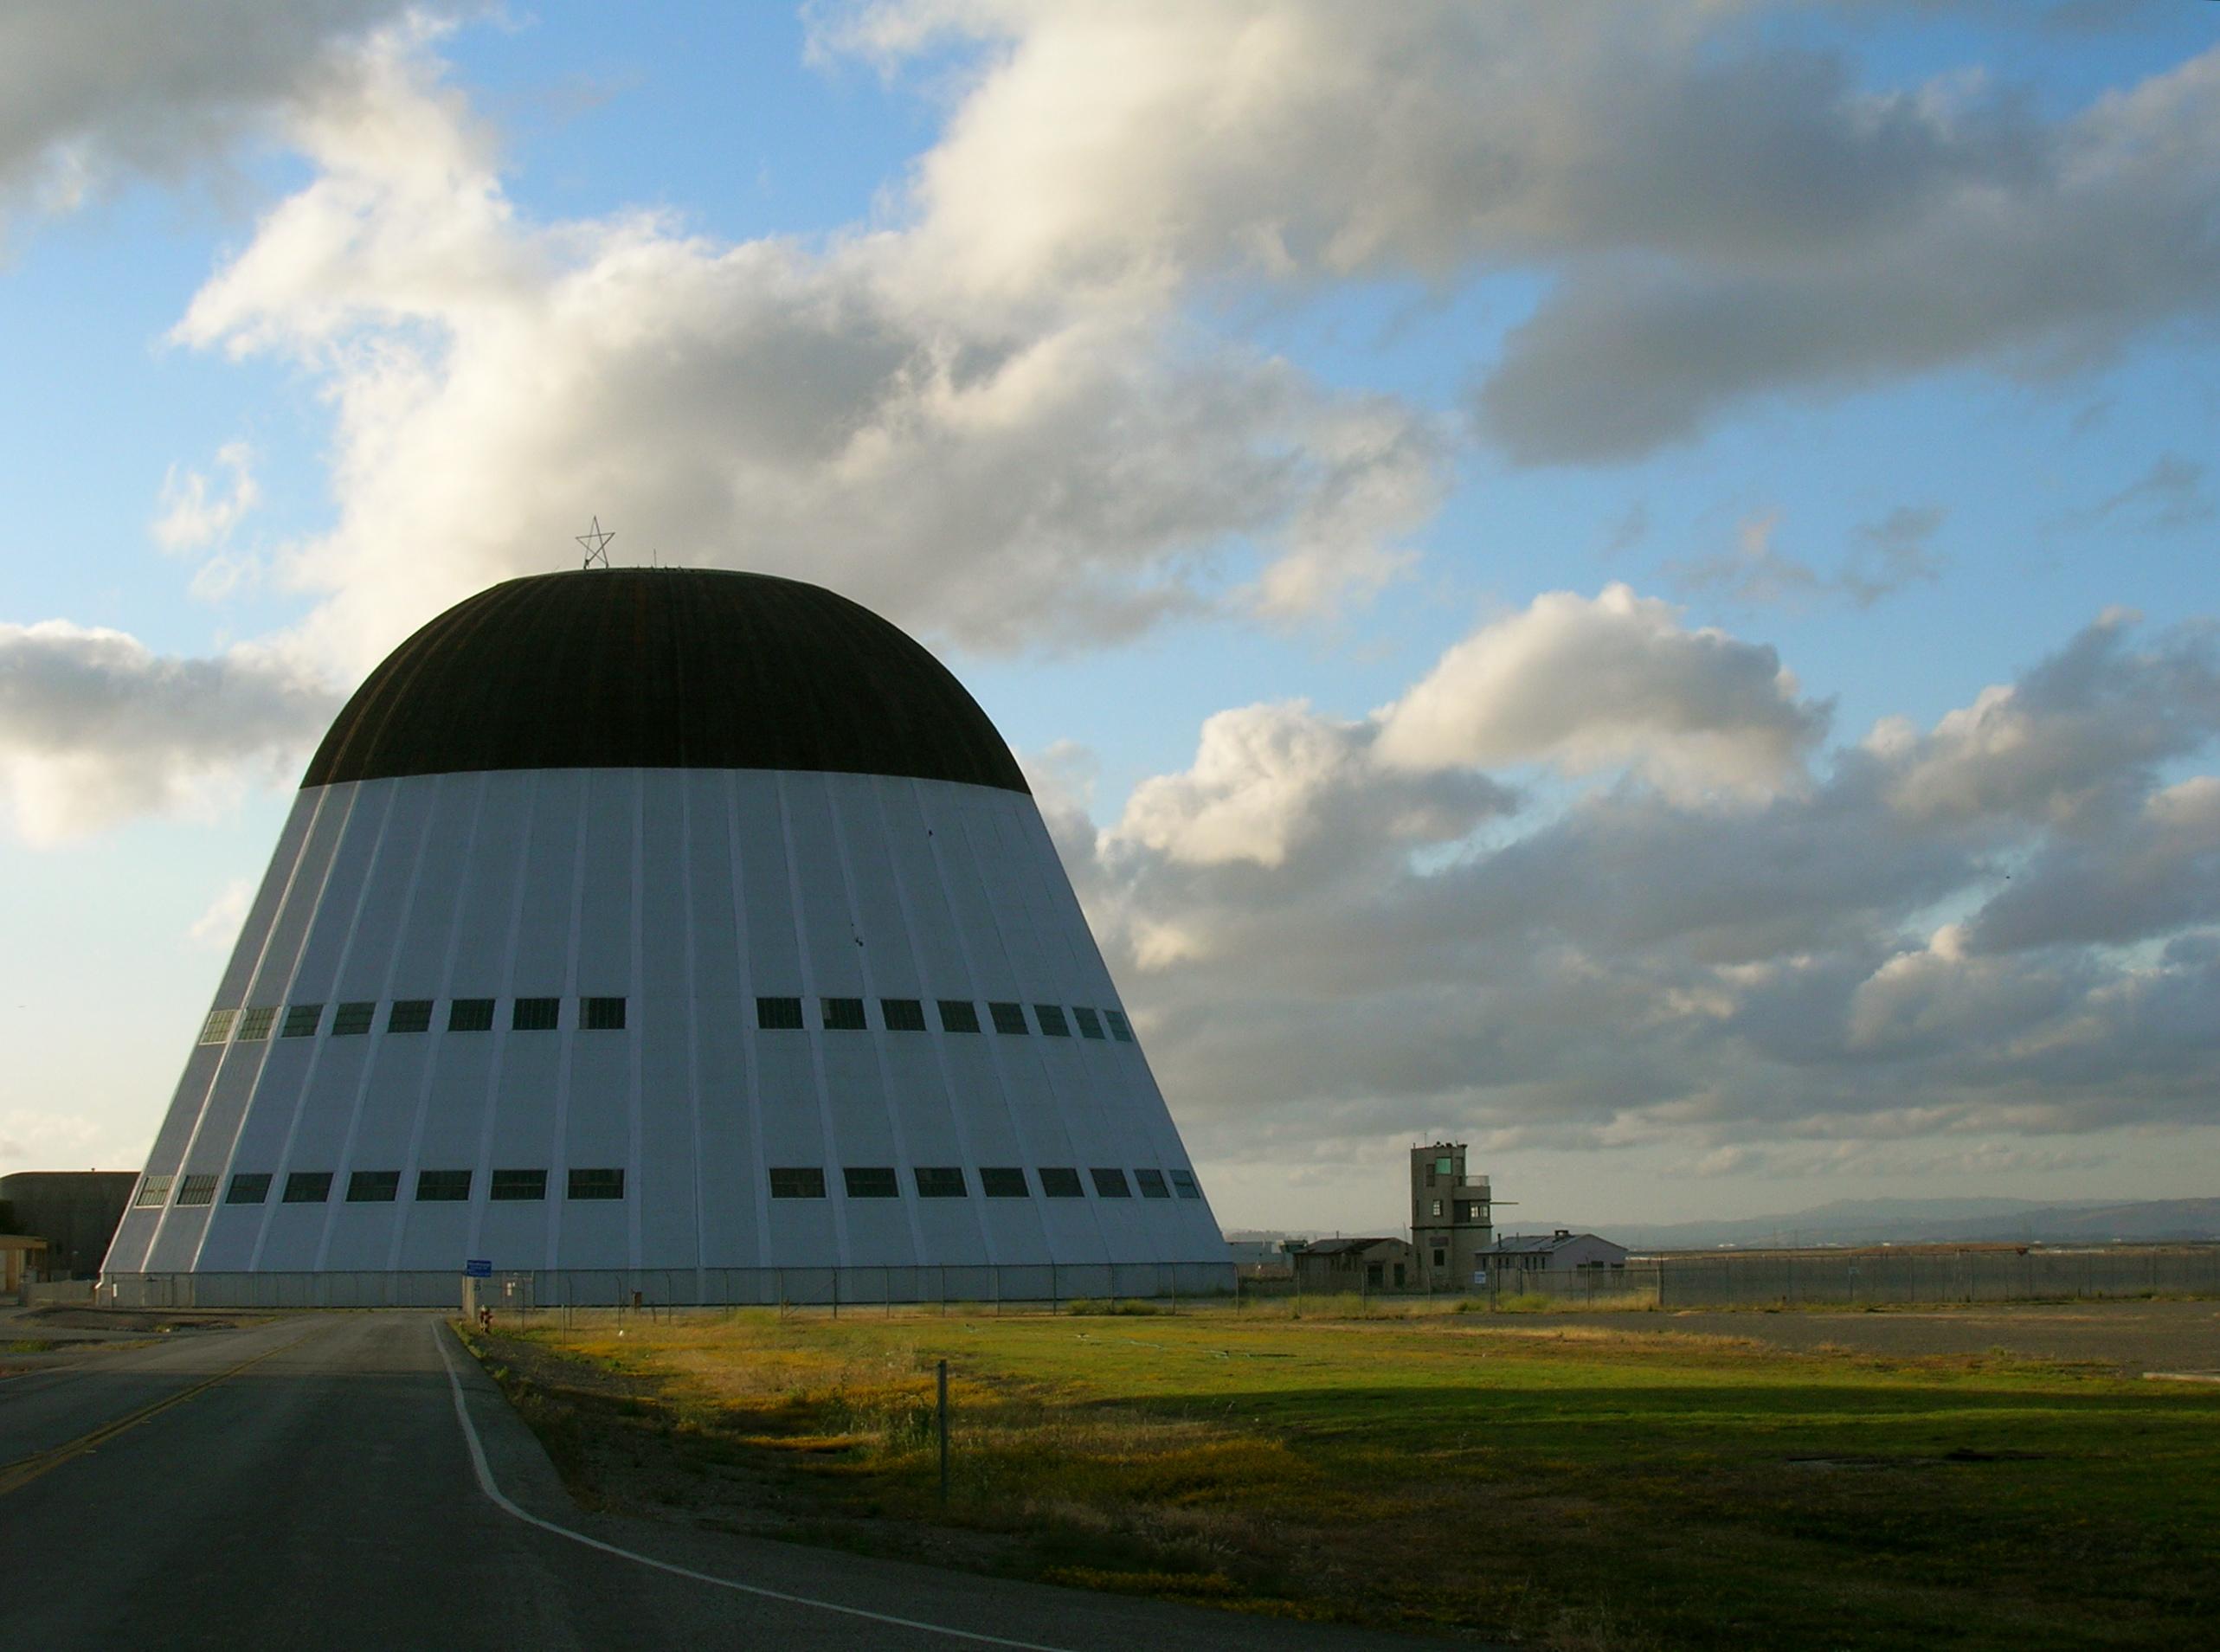 Hangar One, originally a US Navy airship hangar, in Mountain View, California